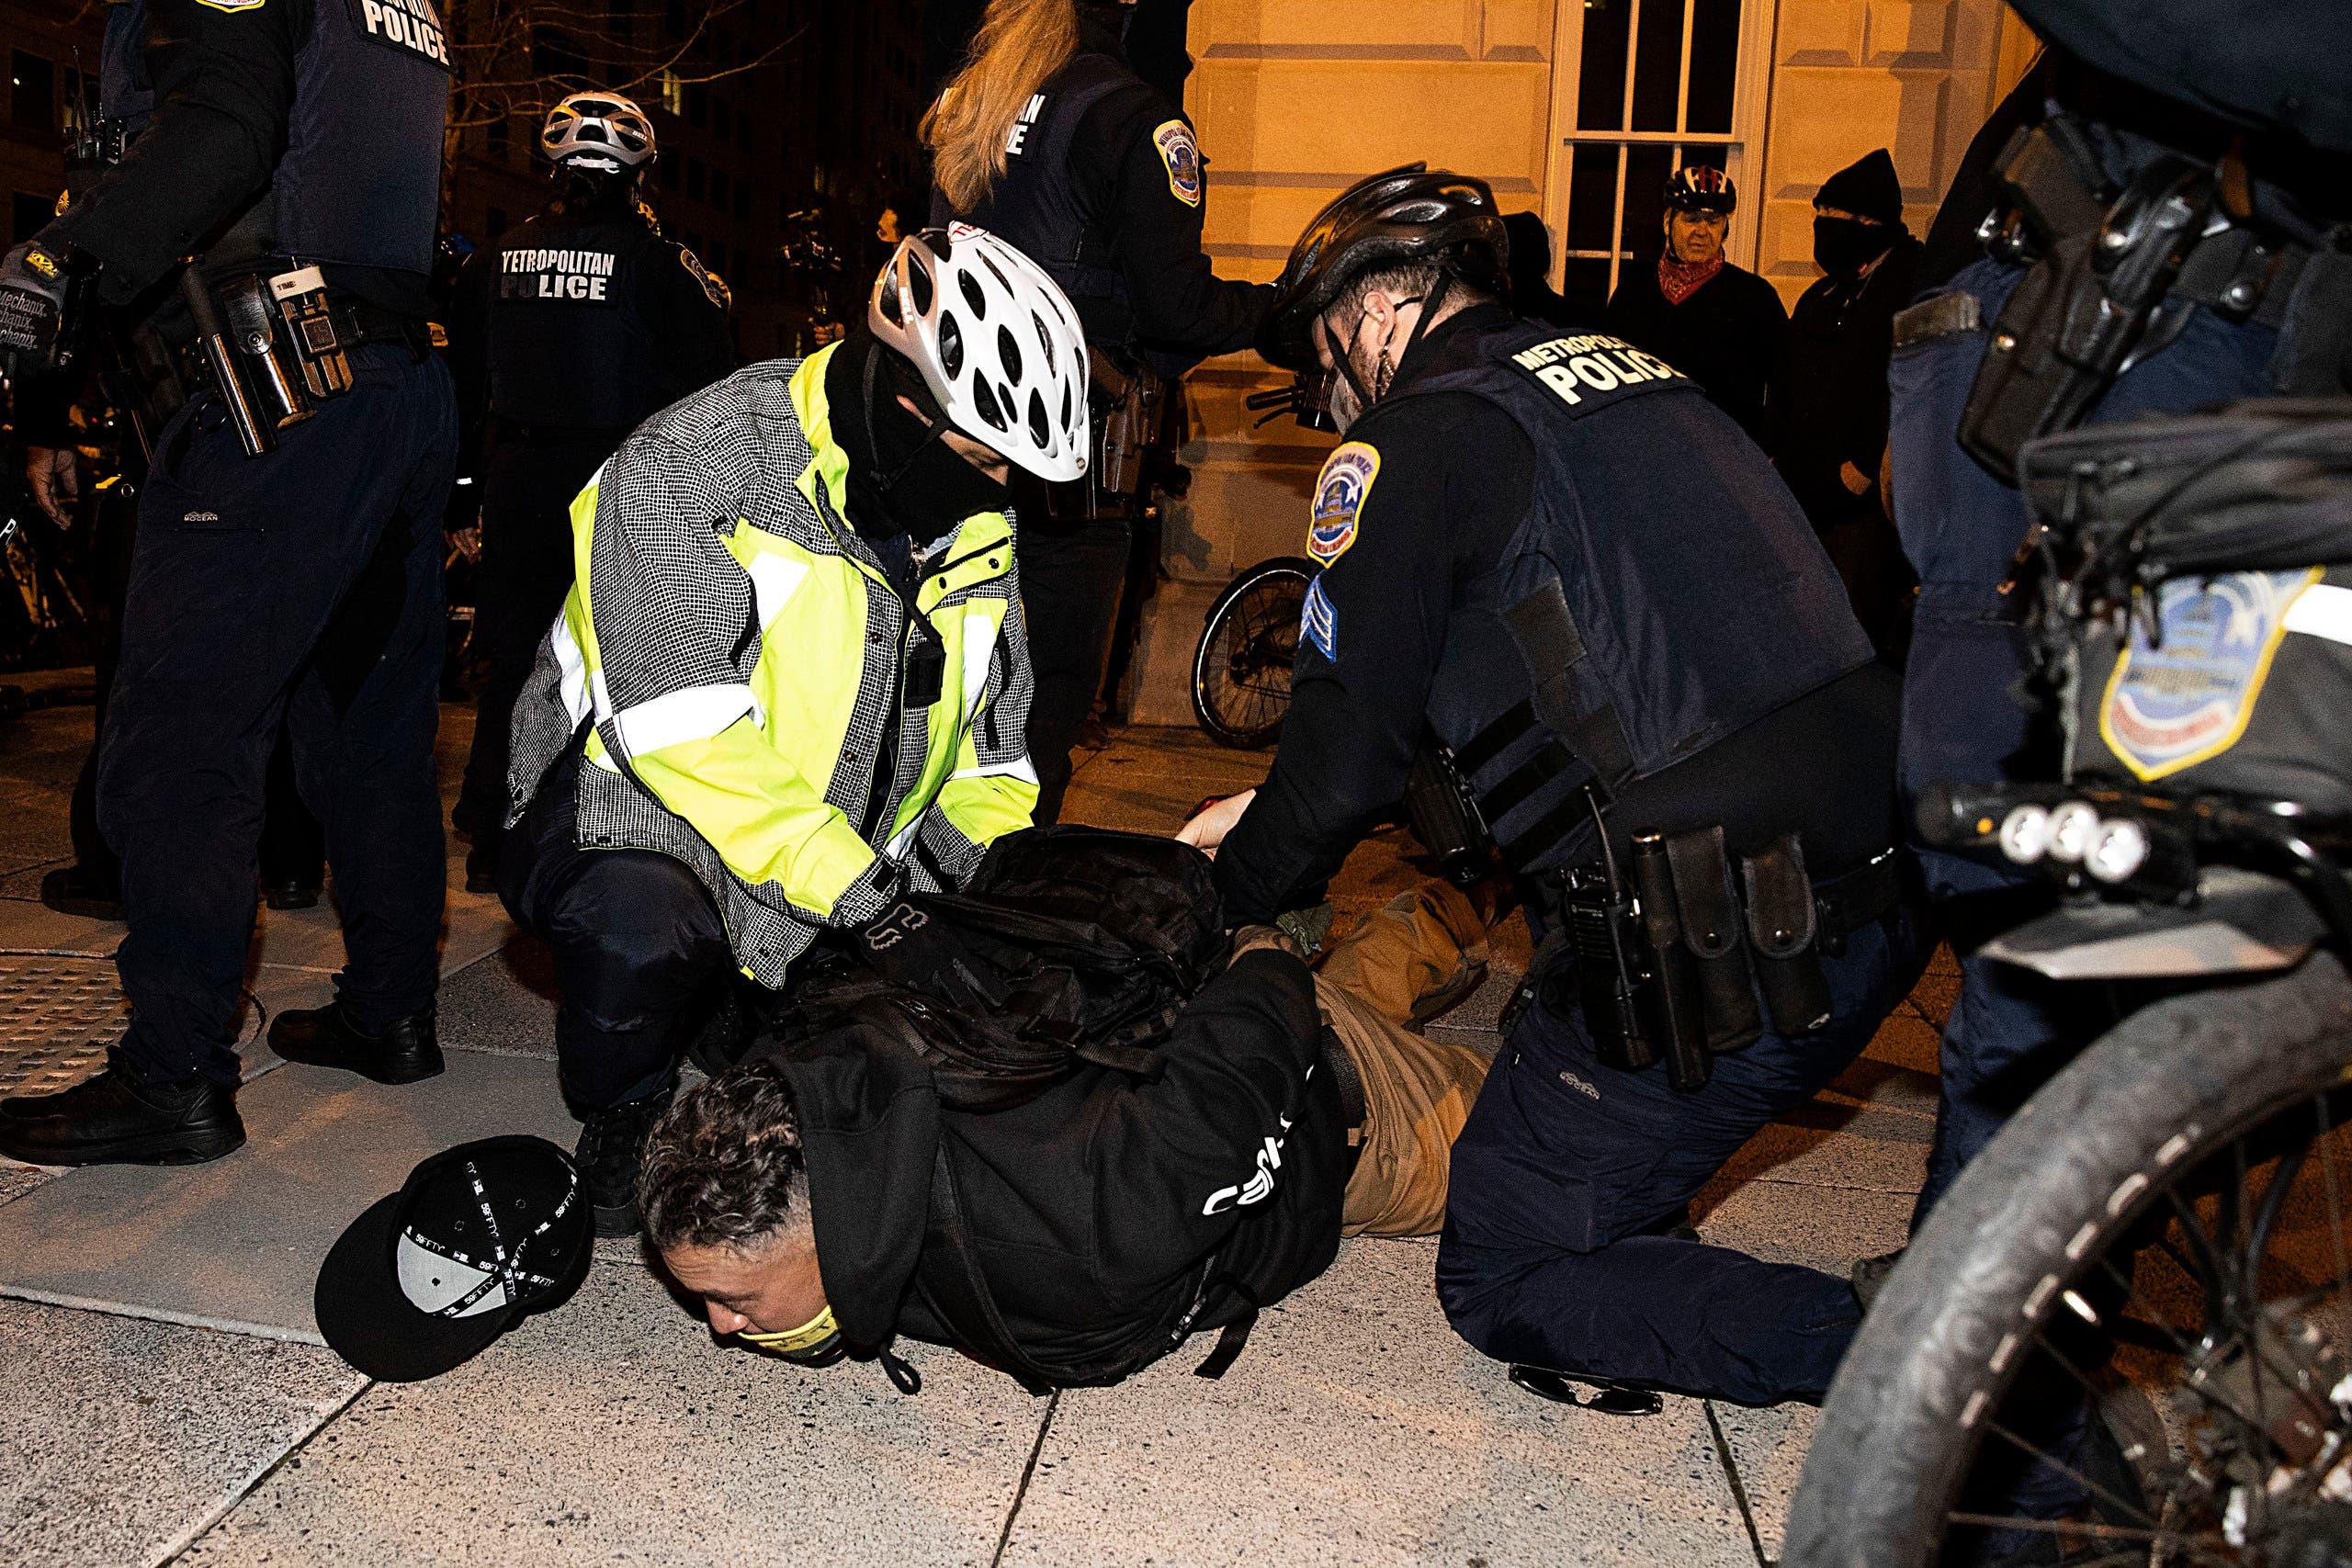 Washington DC Police arrest a member of the Proud Boys near Black Lives Matter Plaza on December 12, 2020 in Washington, DC. (AFP)